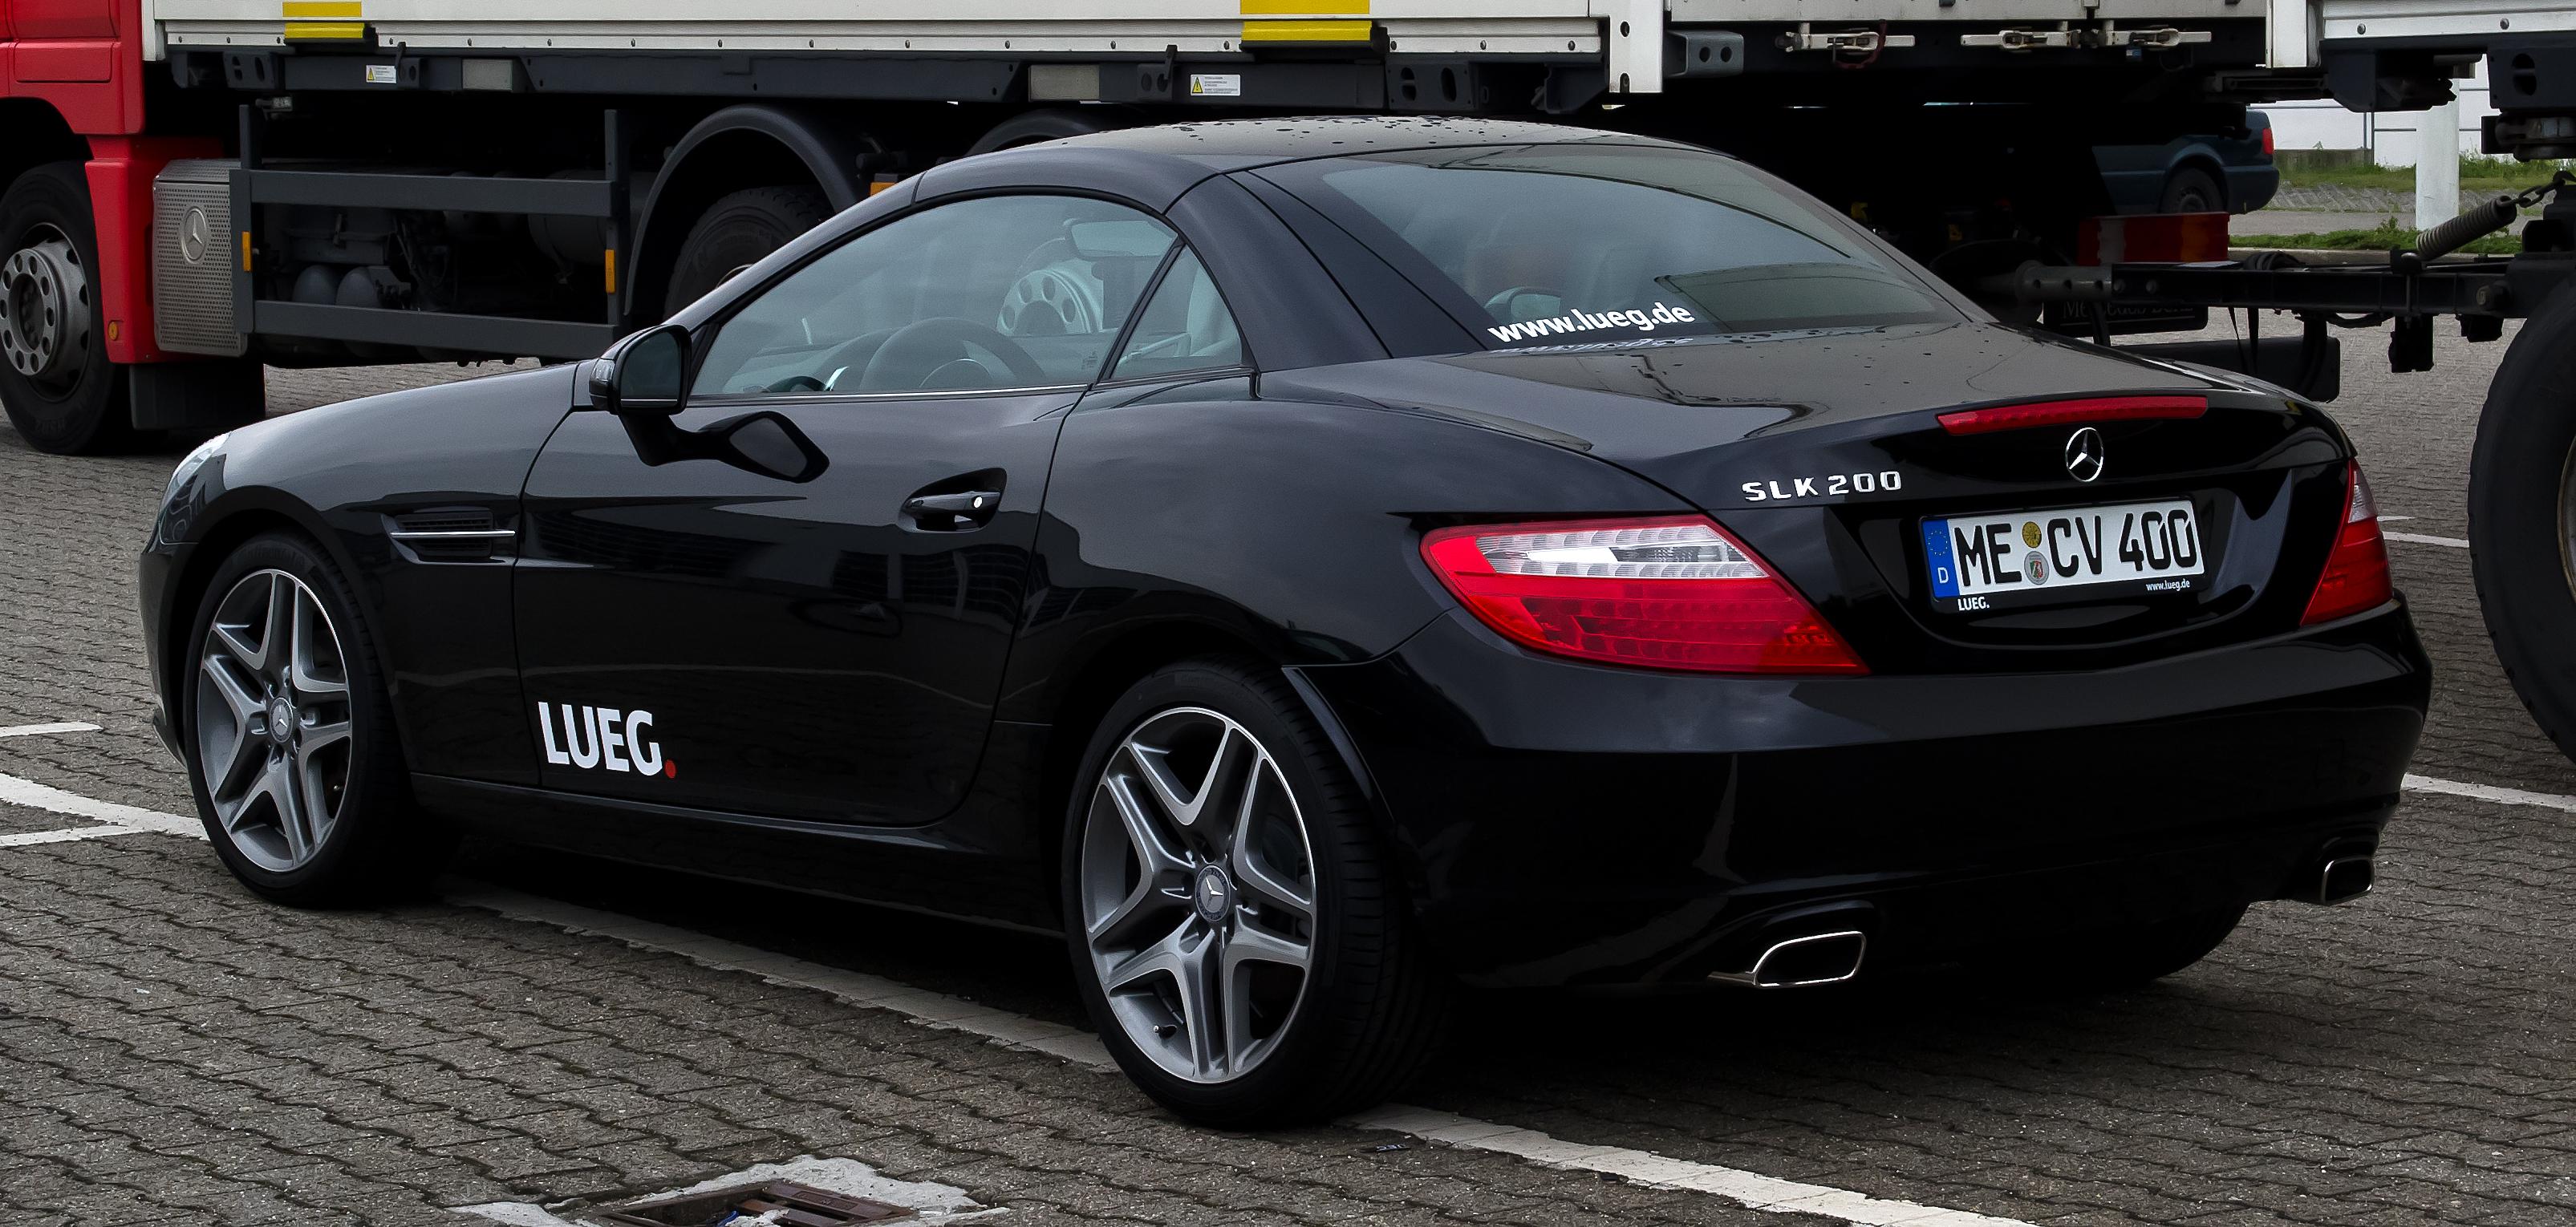 Mercedes Benz Slk 200 Picture 11 Reviews News Specs Buy Car